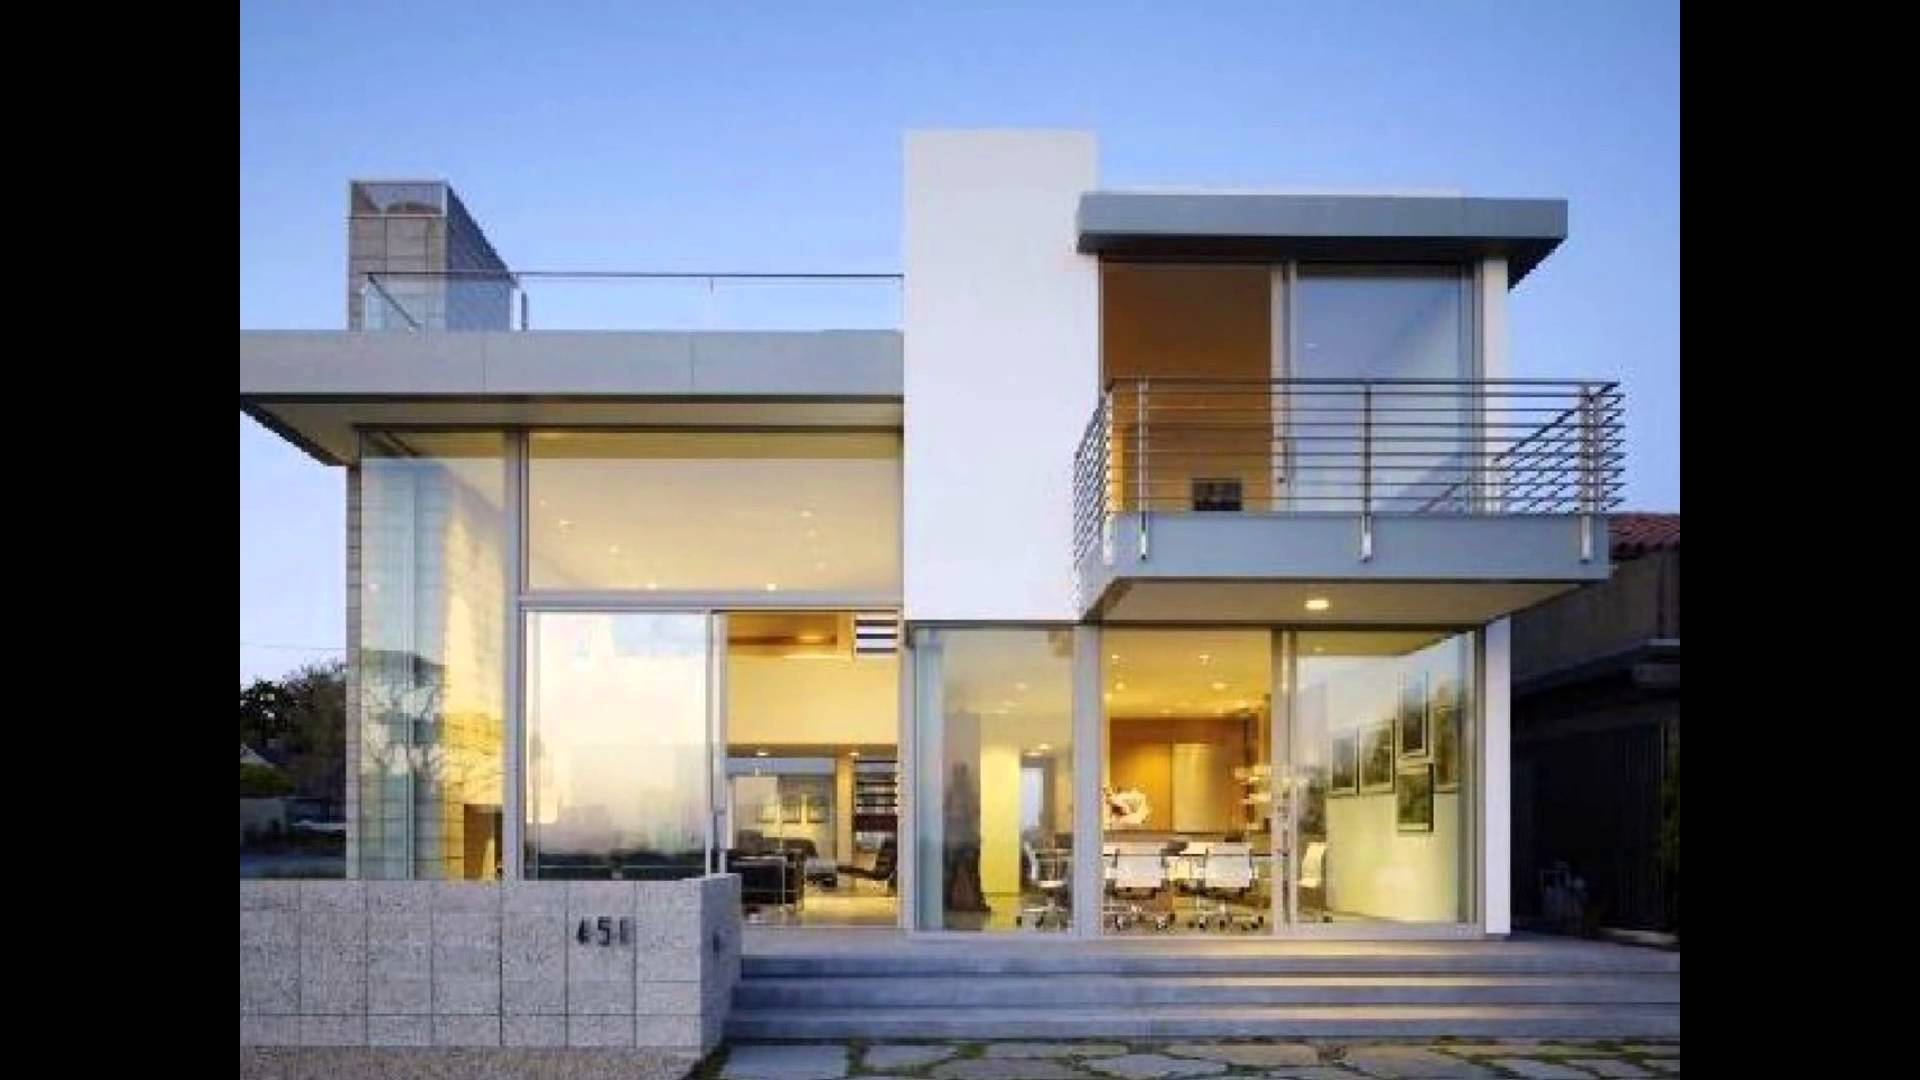 minimalist house design minimalist home design september 2015 LQGIIBO